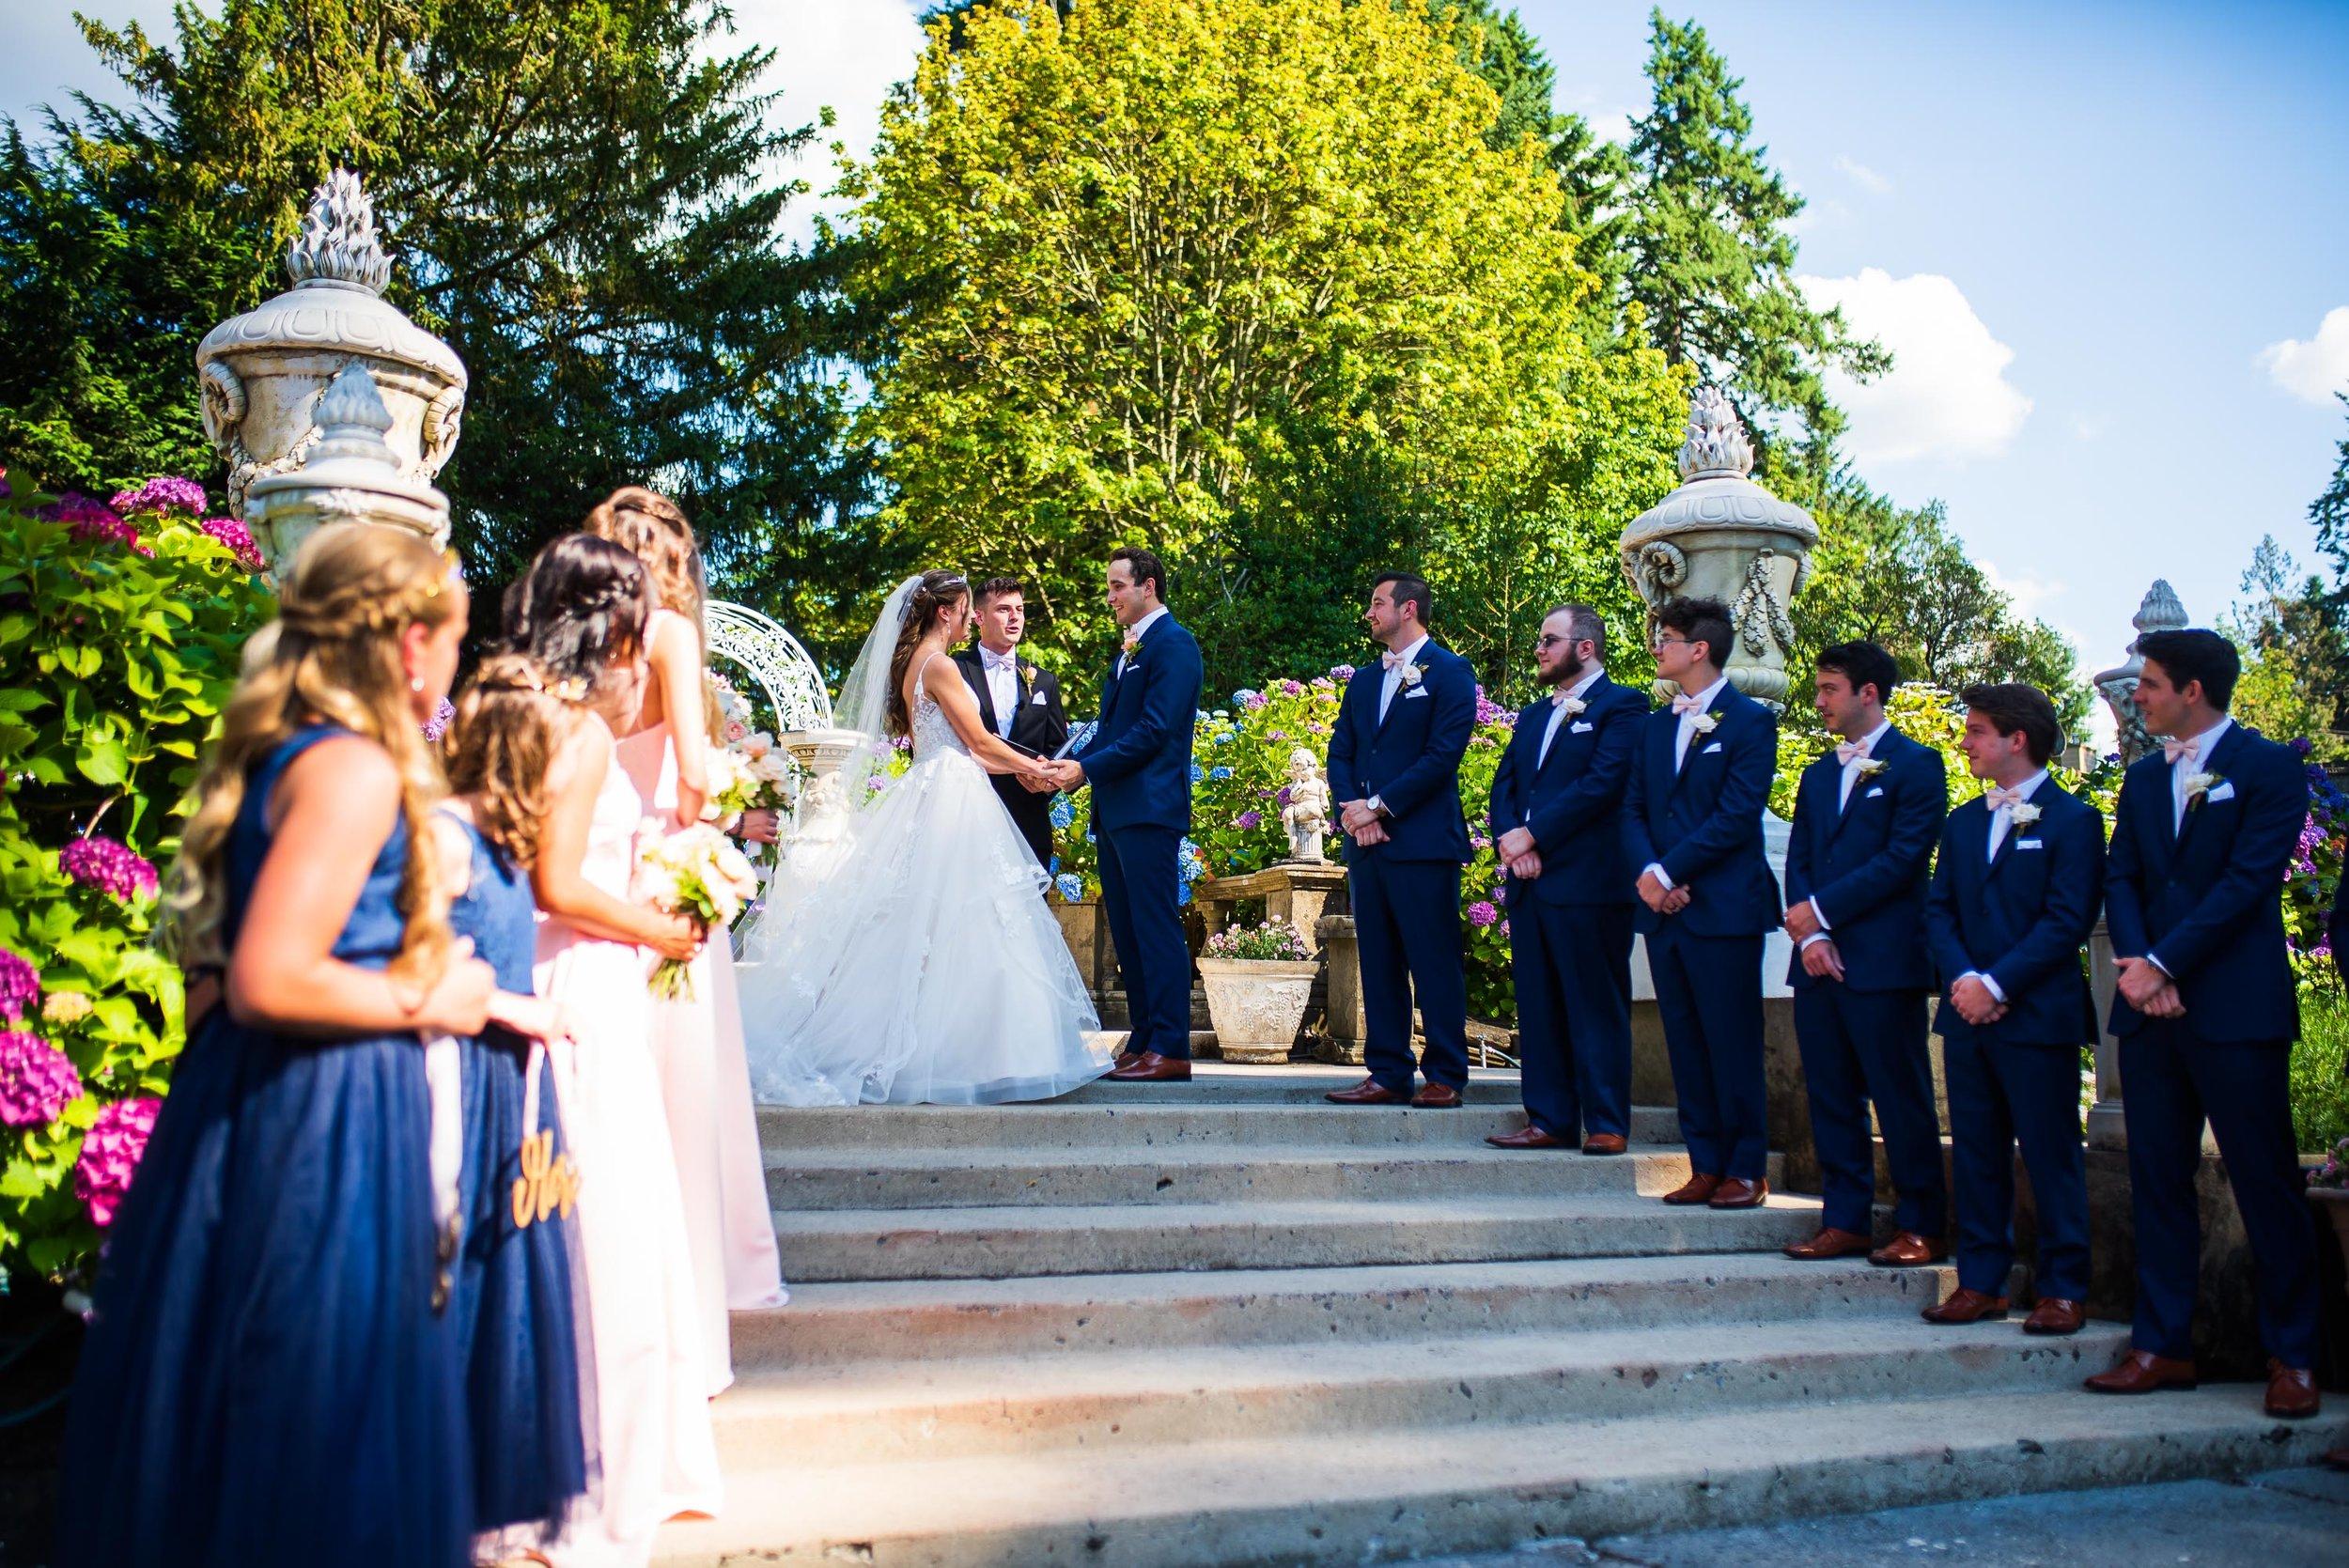 thornewood castle wedding 50.jpg